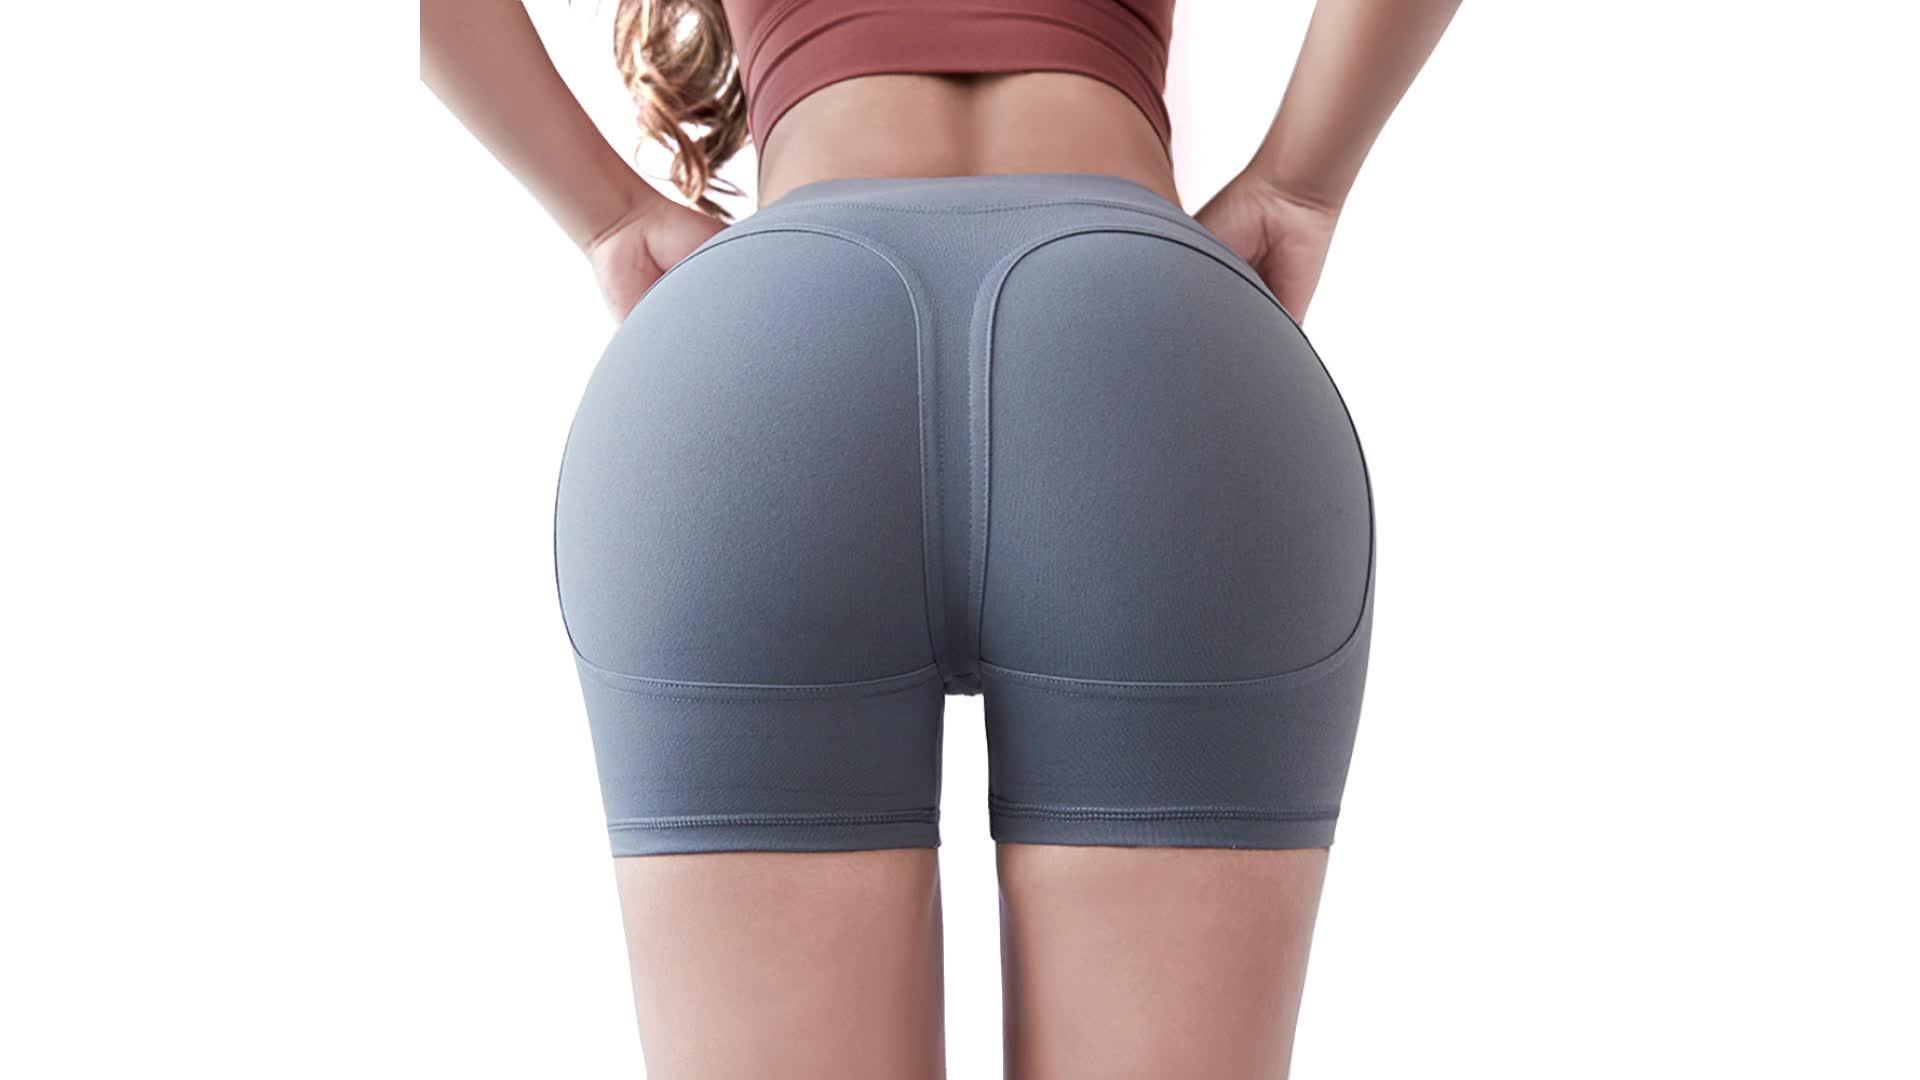 Großhandel Frauen Kurze Yoga Sport Leggings, Atmungsaktiv Bauch-steuer Shaper Yoga Sport Leggings